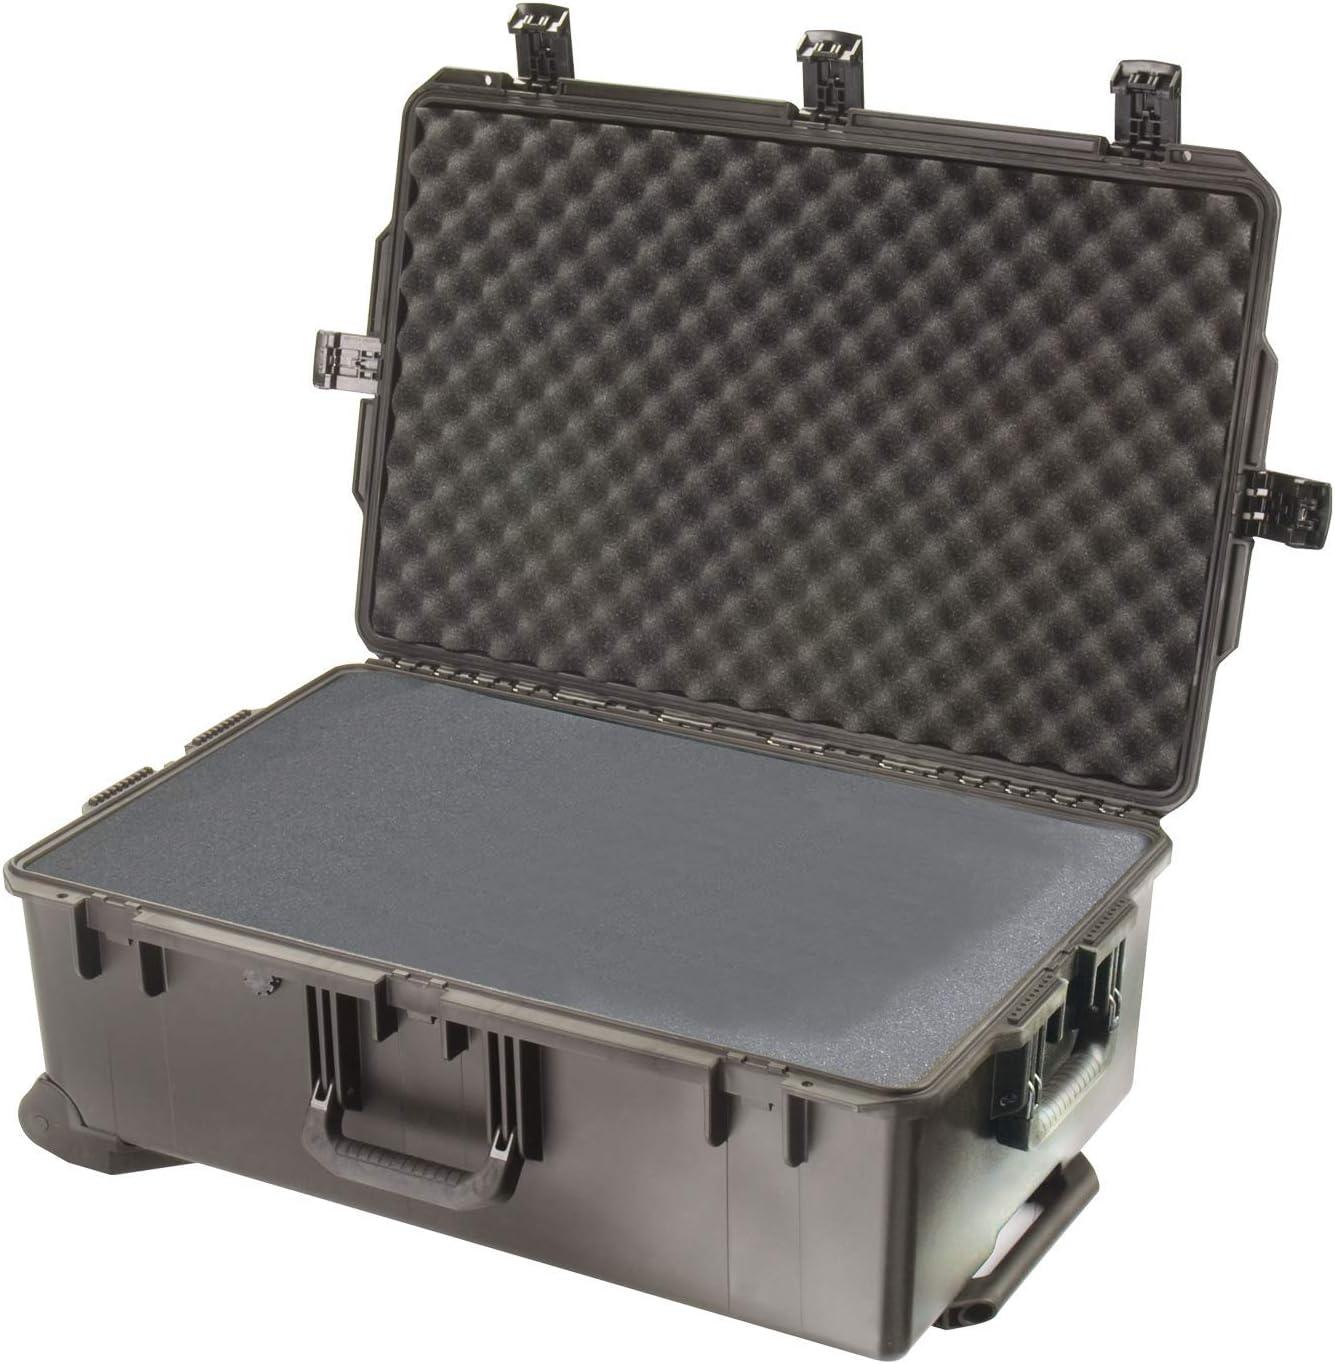 Waterproof Case Pelican Storm iM2950 Case With Foam Black